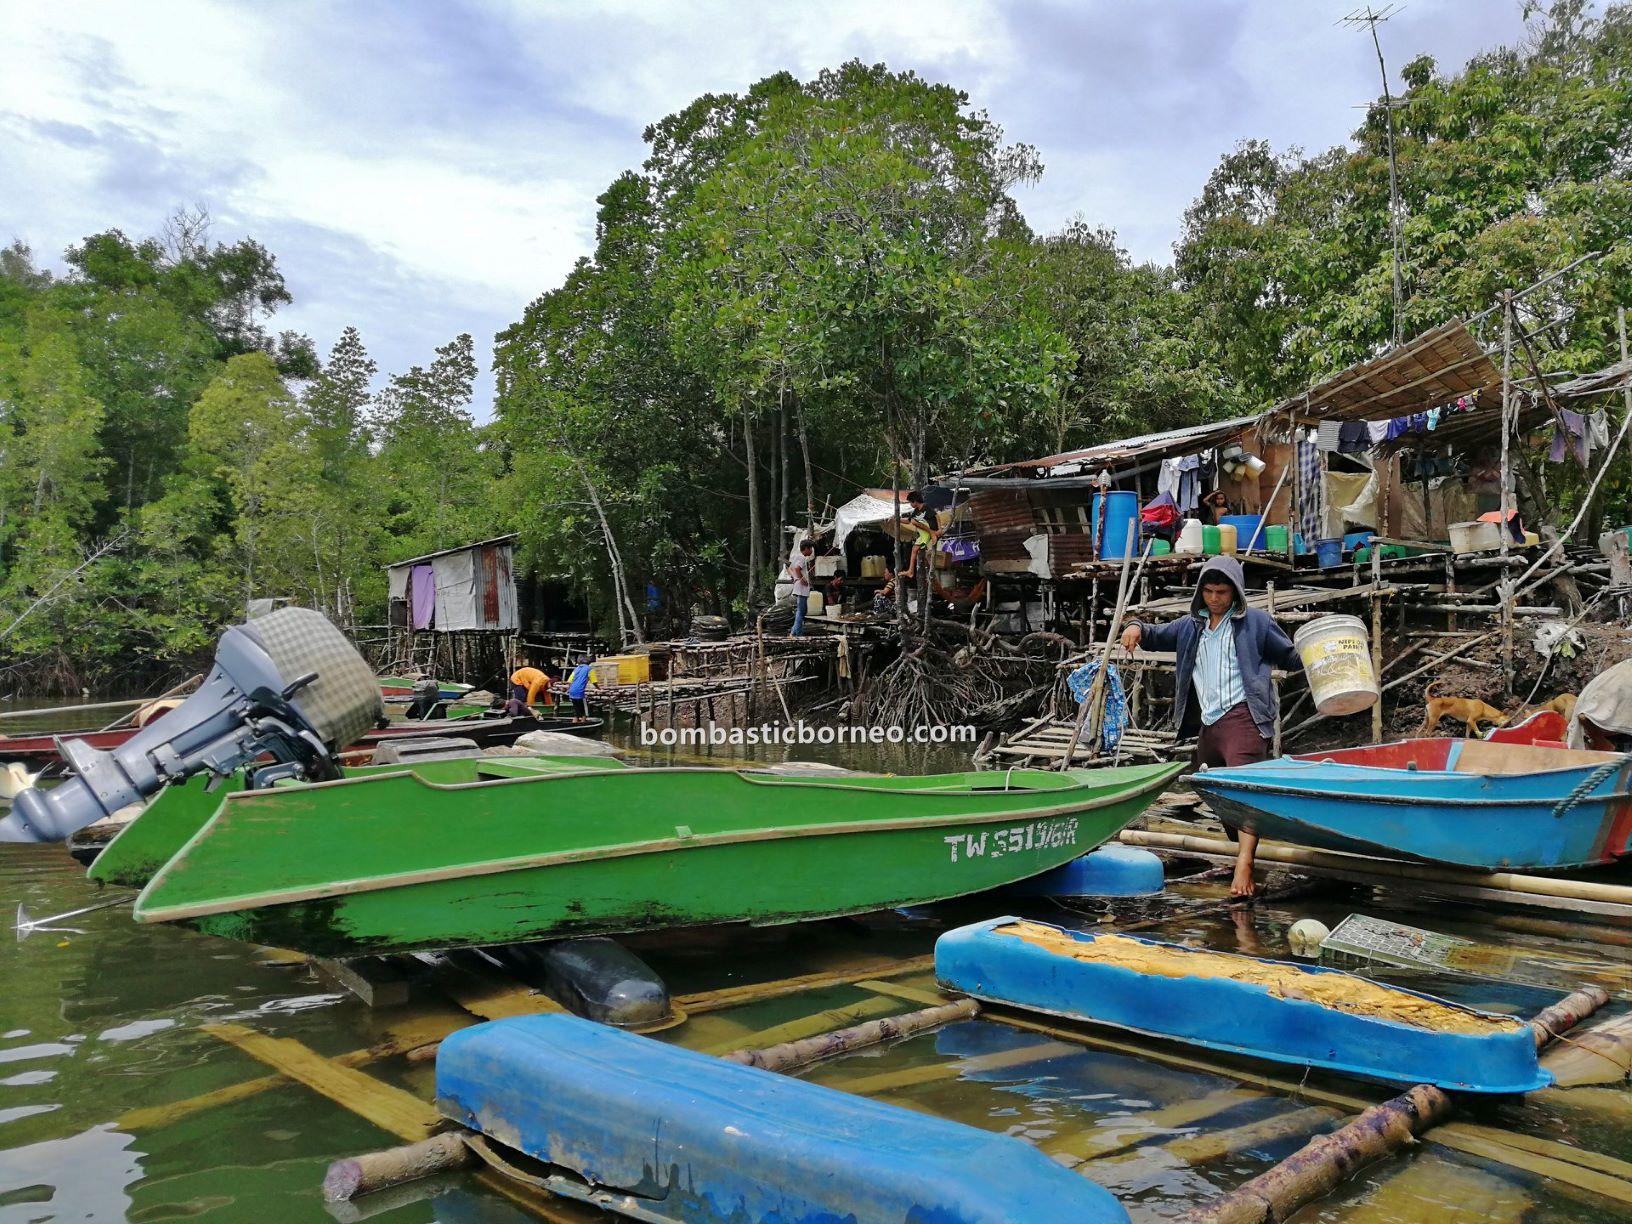 Sea Gypsies, fishing village, Pulau, boat ride, jelajah, exploration, adventure, backpackers, Bajau Laut, mangrove forest, tourism, Cross Border, 穿越婆罗洲游踪, 马来西亚沙巴